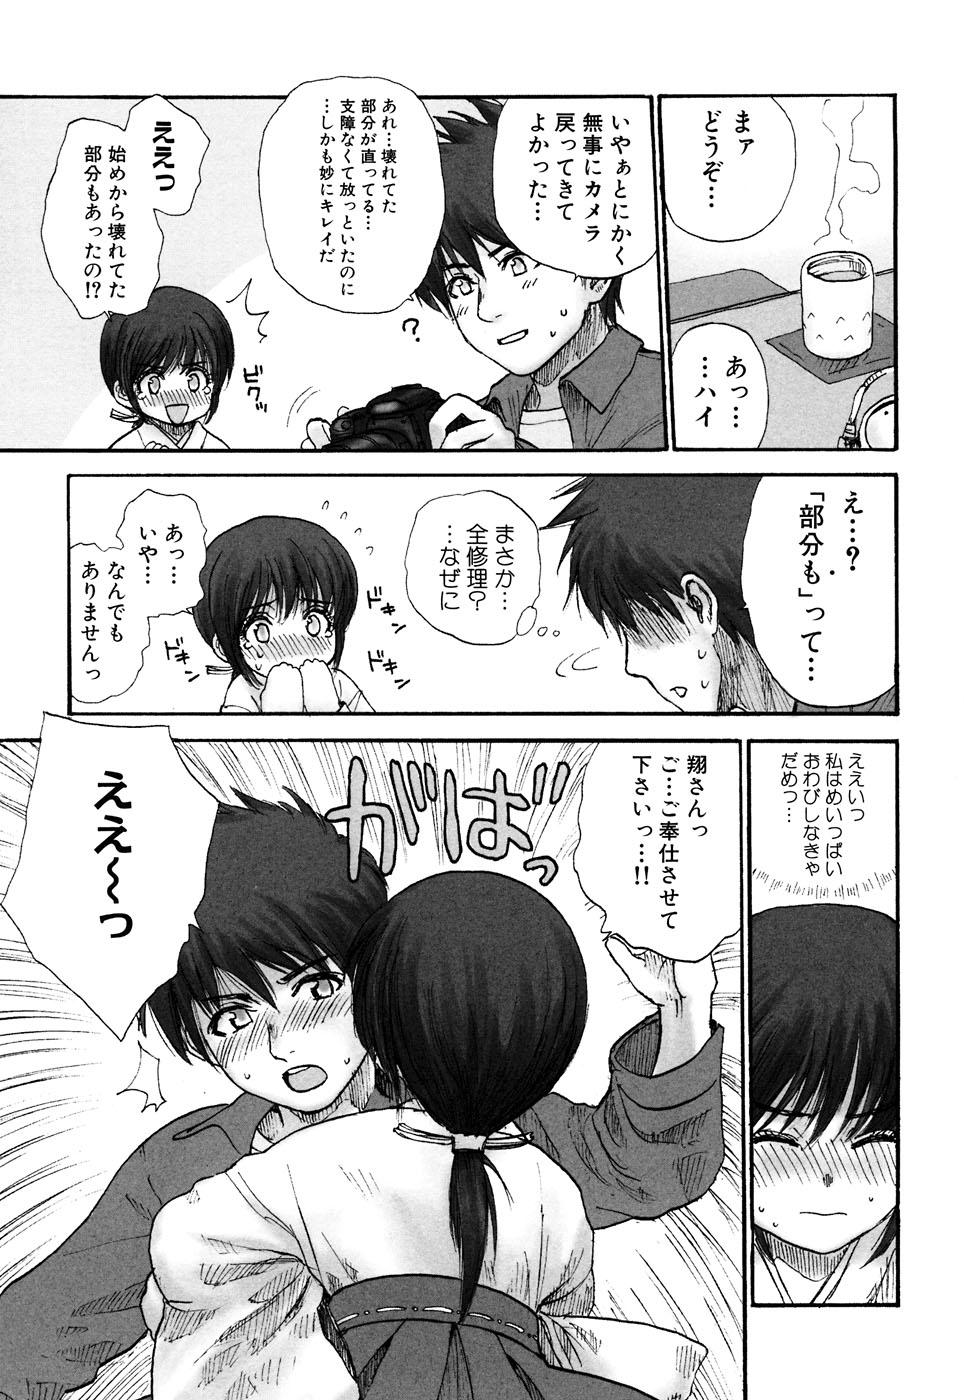 Fechikko VS Series ROUND.2 Miko San VS Maid San 75